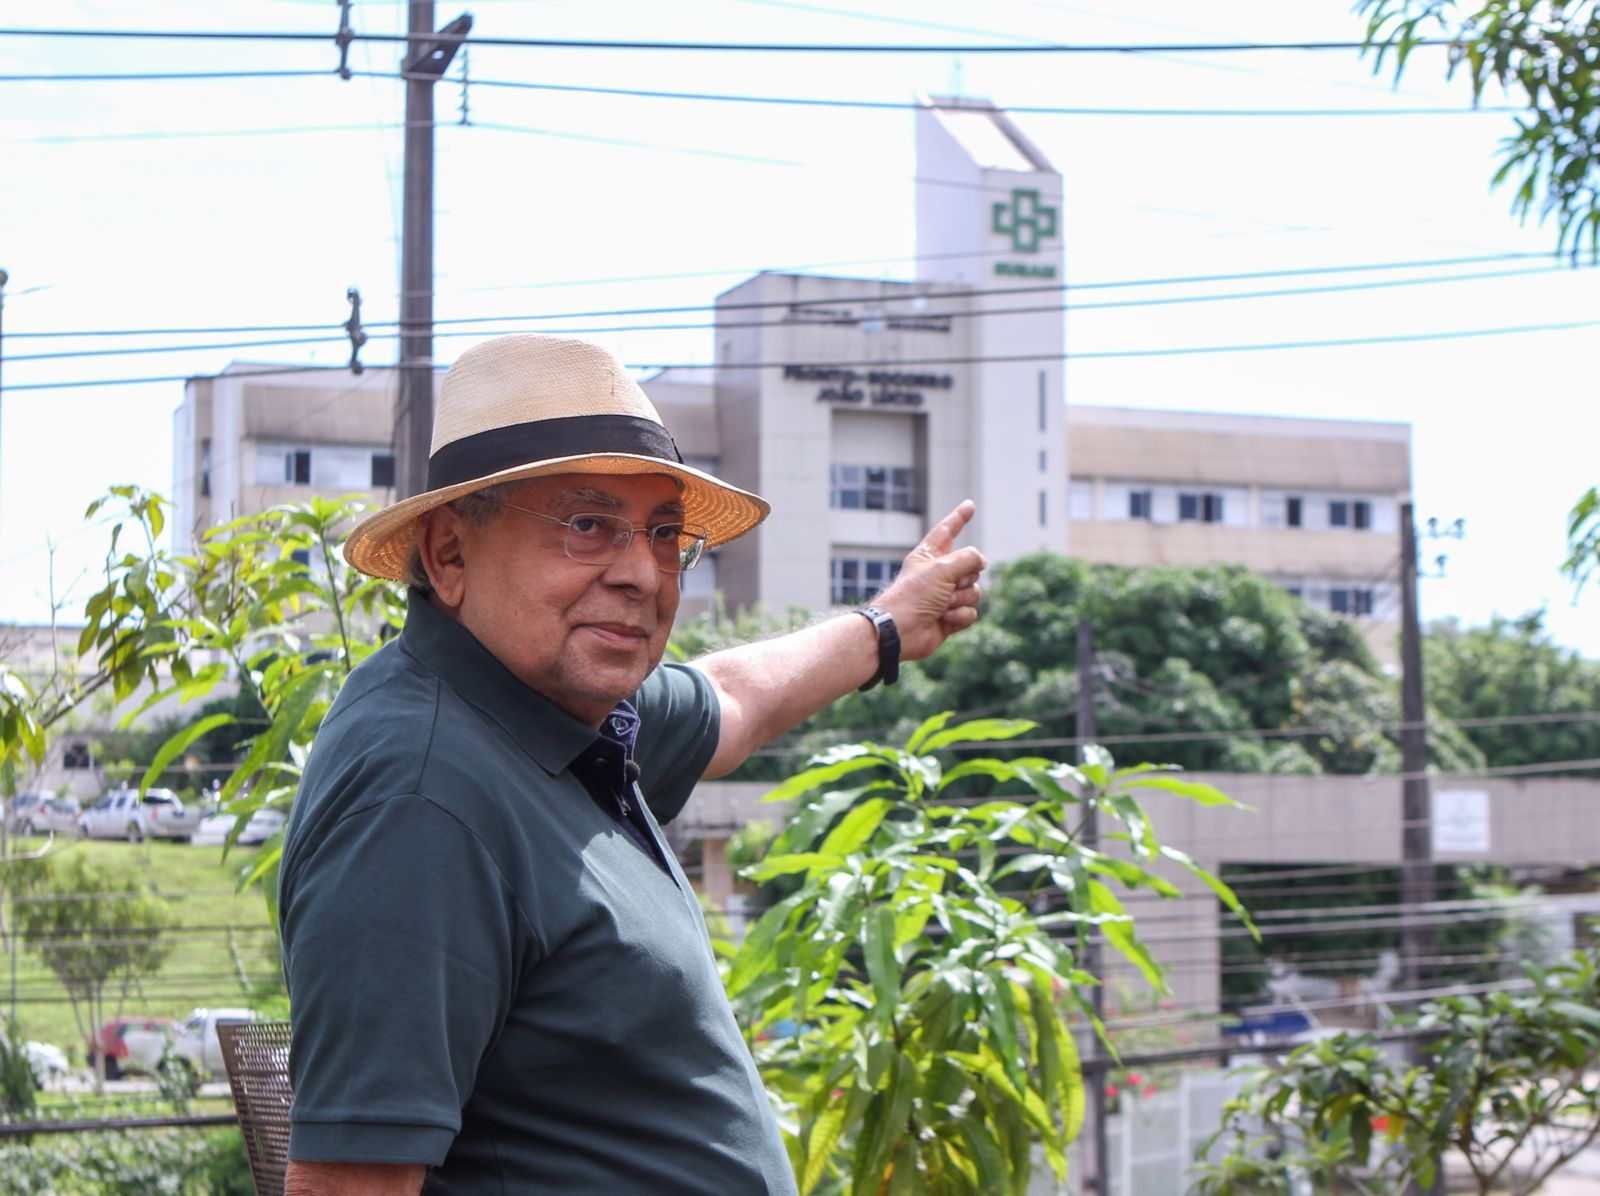 Das hemodiálises para as ruas, Amazonino entra na maratona 2022